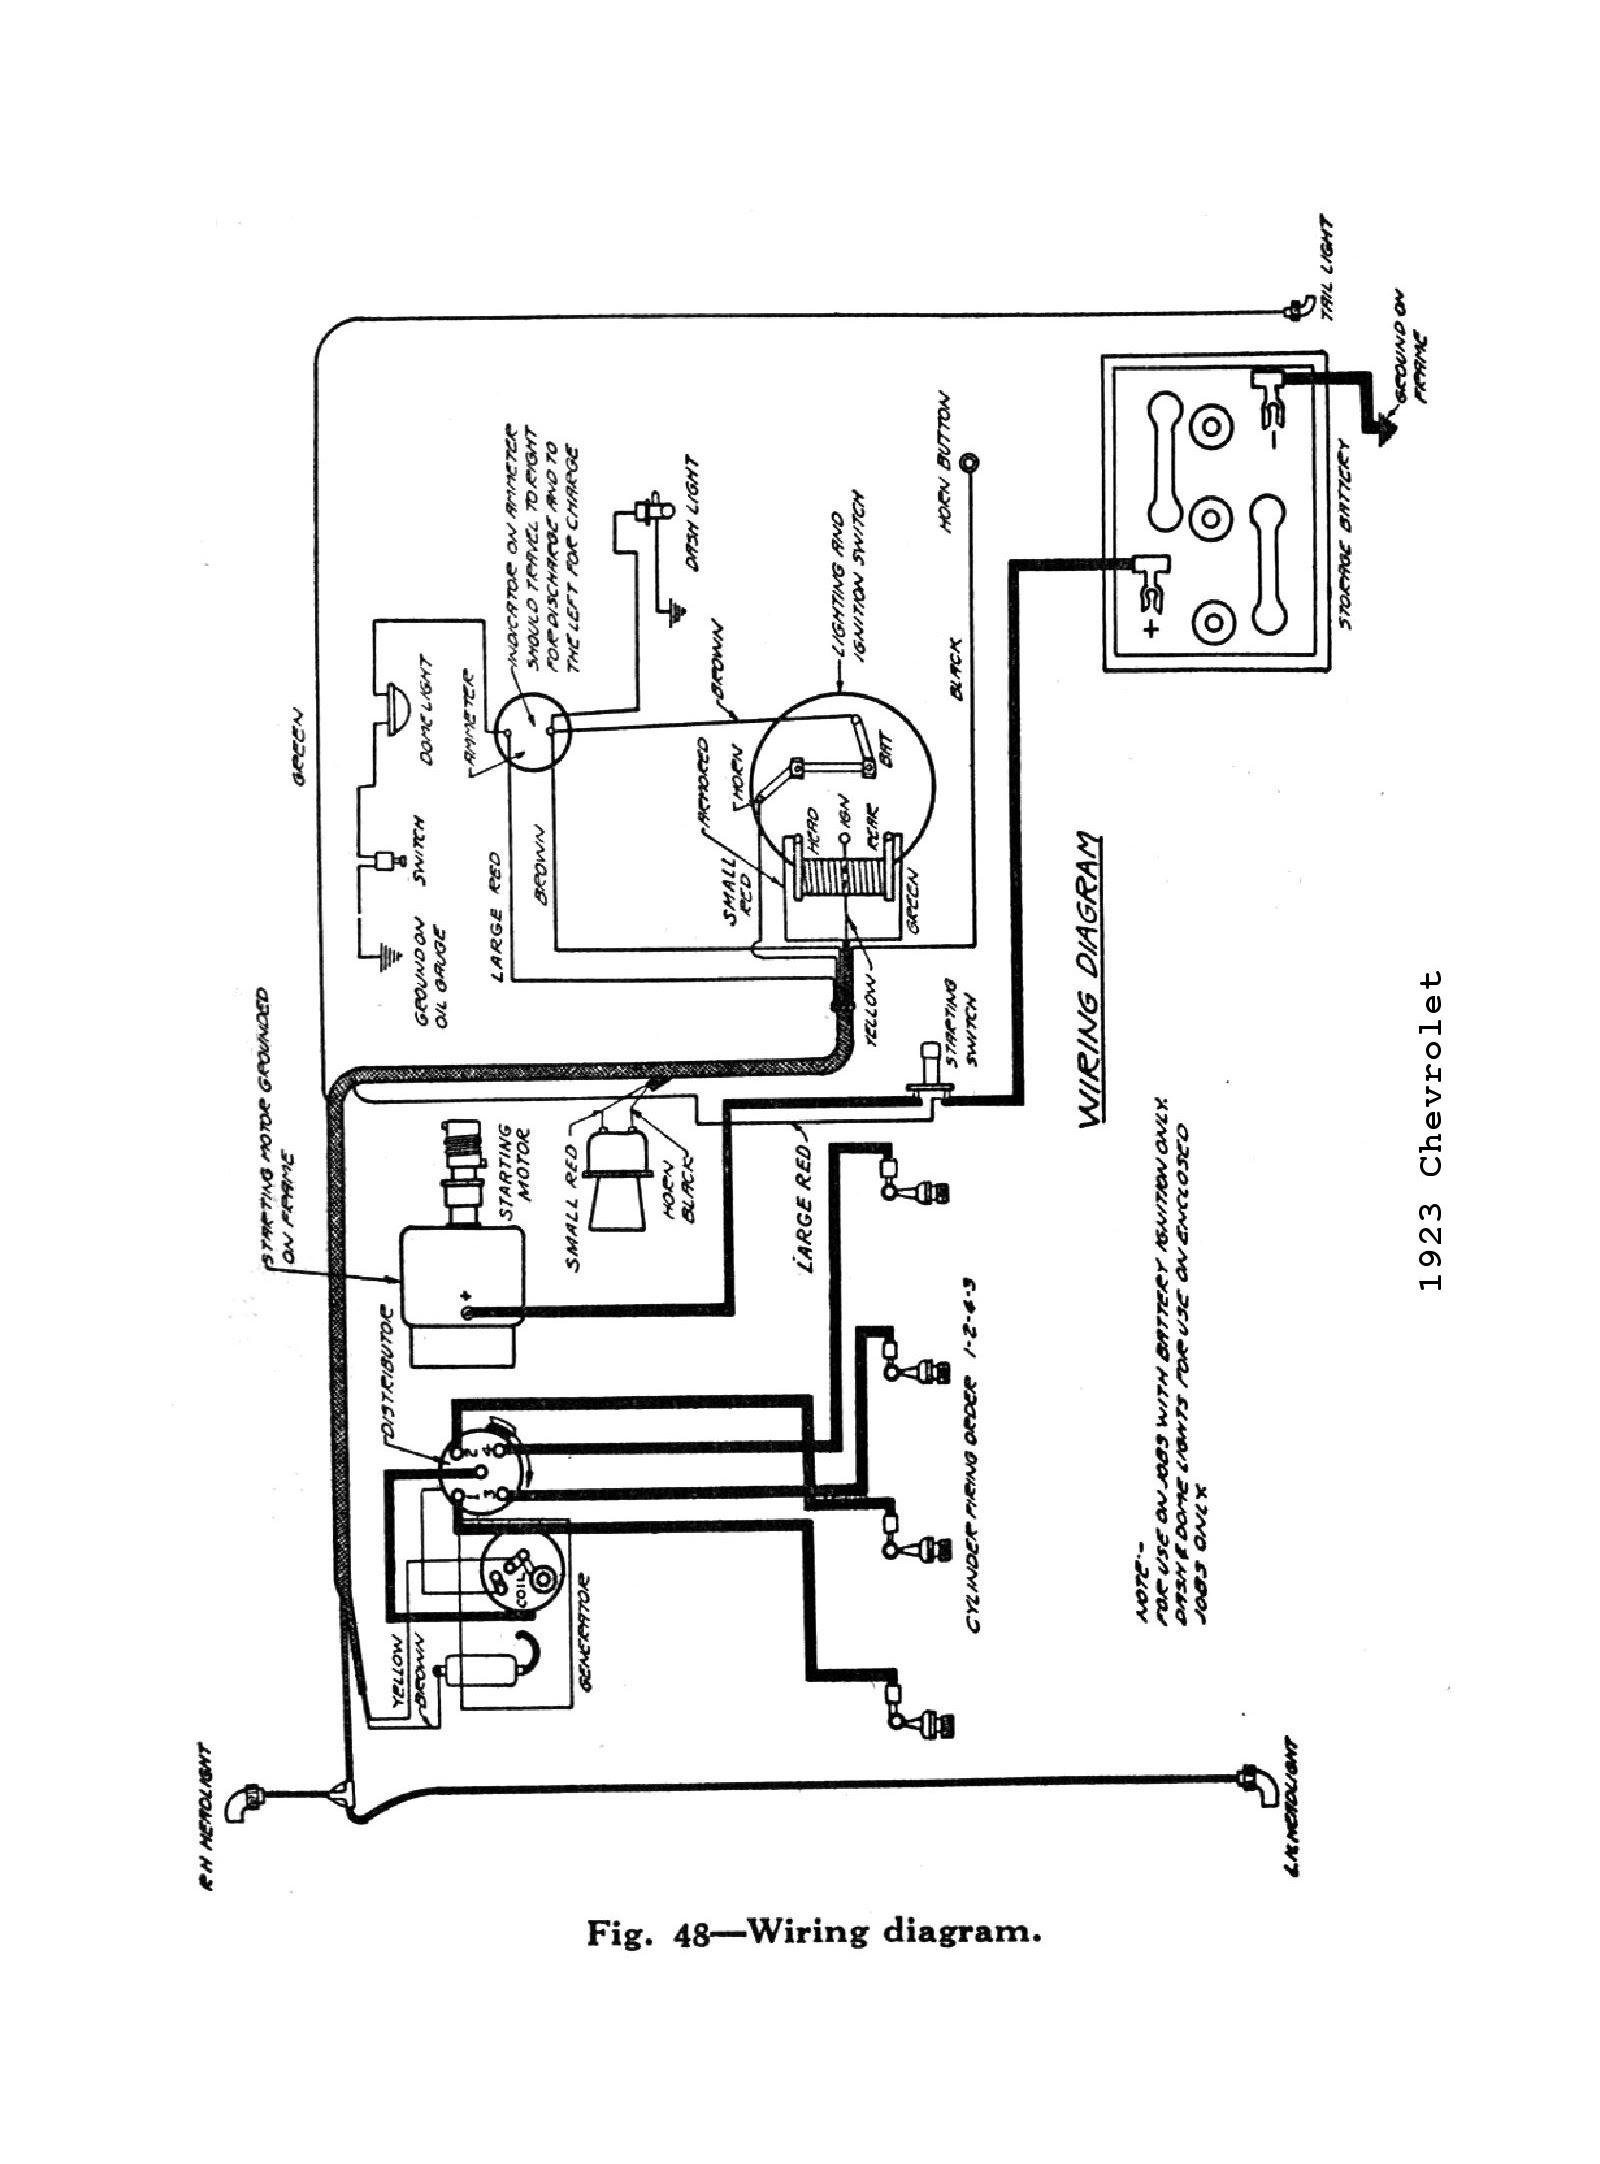 1998 Buick Regal Wiring Diagram